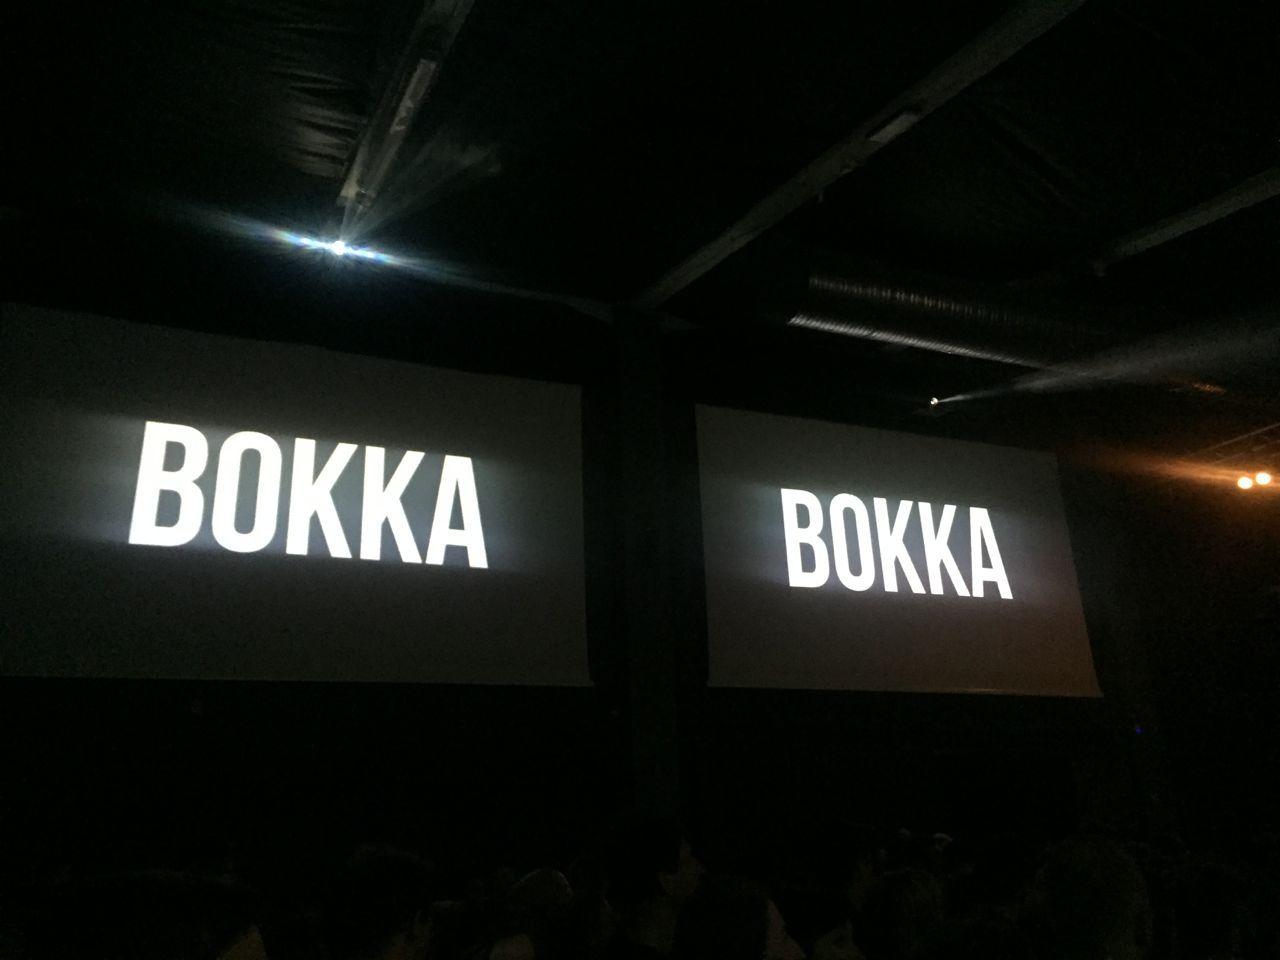 Bokka Krakkow Dziekki Broadway Shows Concert Cinema